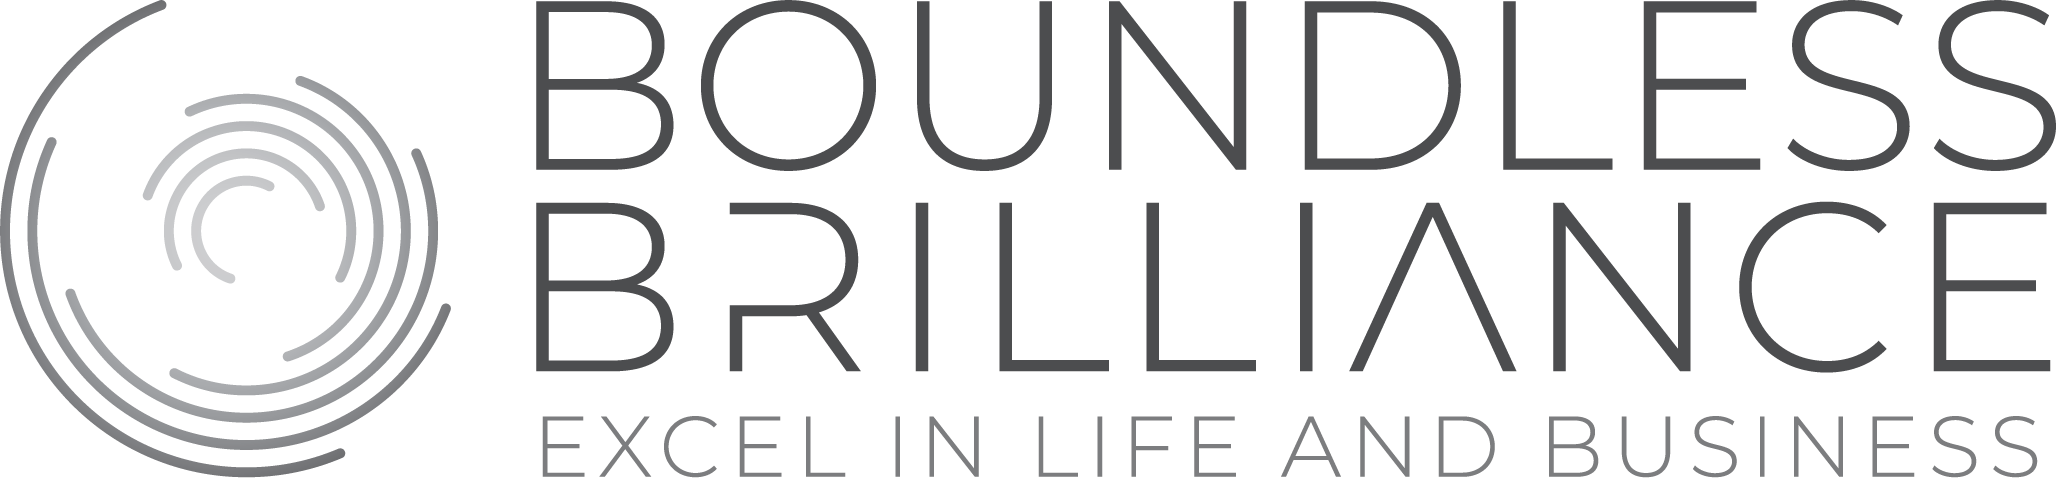 Boundless Brilliance  logo